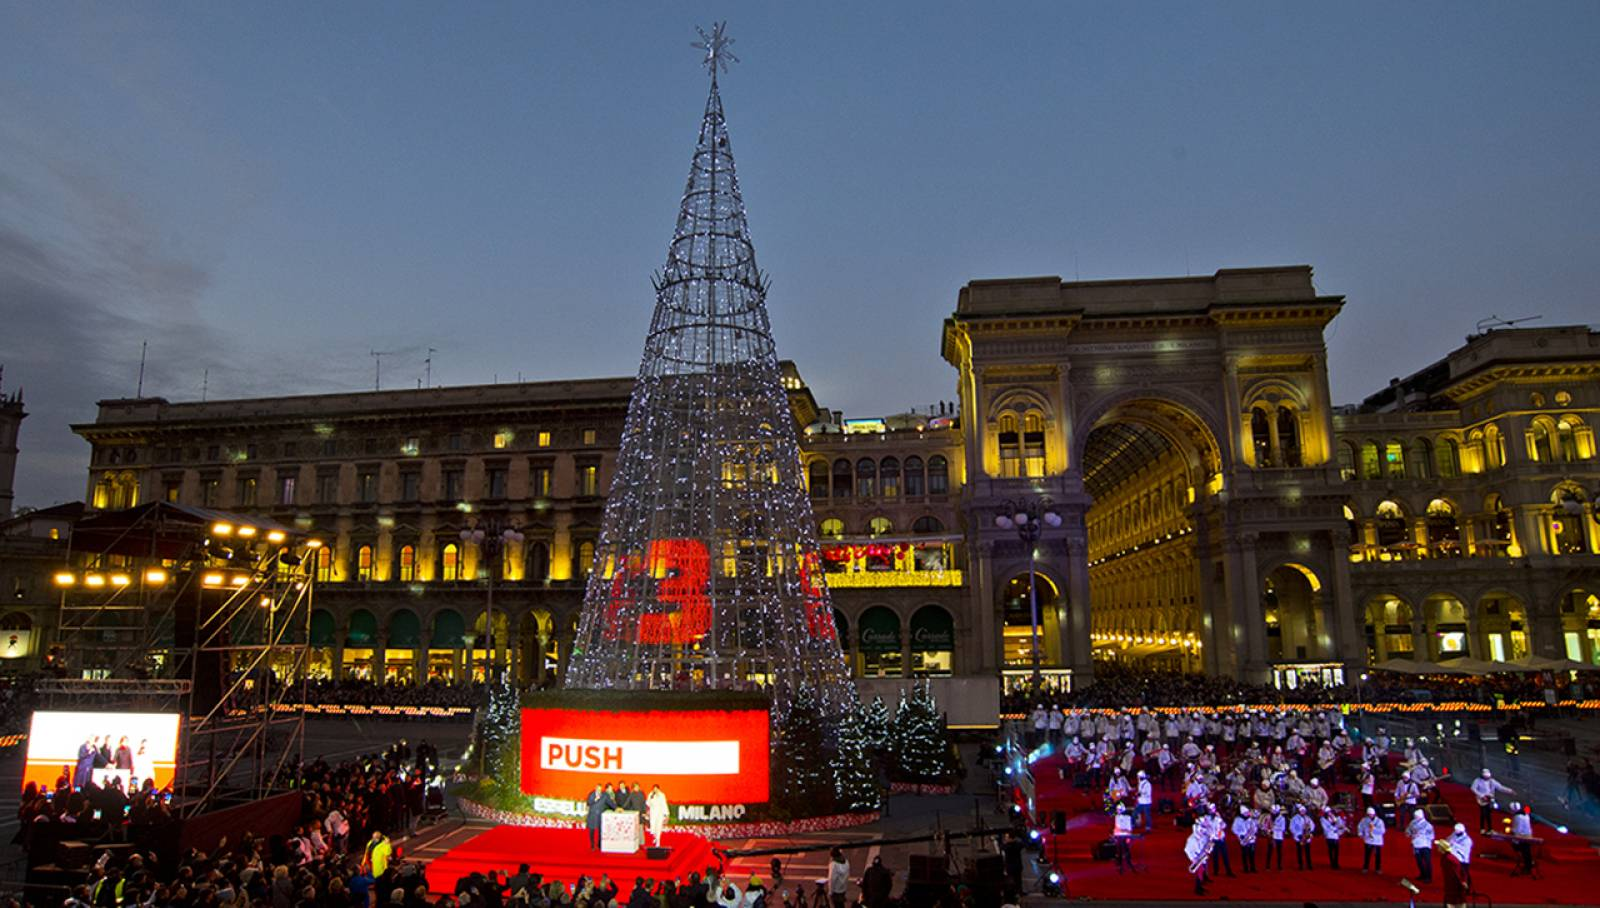 Natale 2019 Albero Esselunga Piazza Duomo Milano IGPDecaux